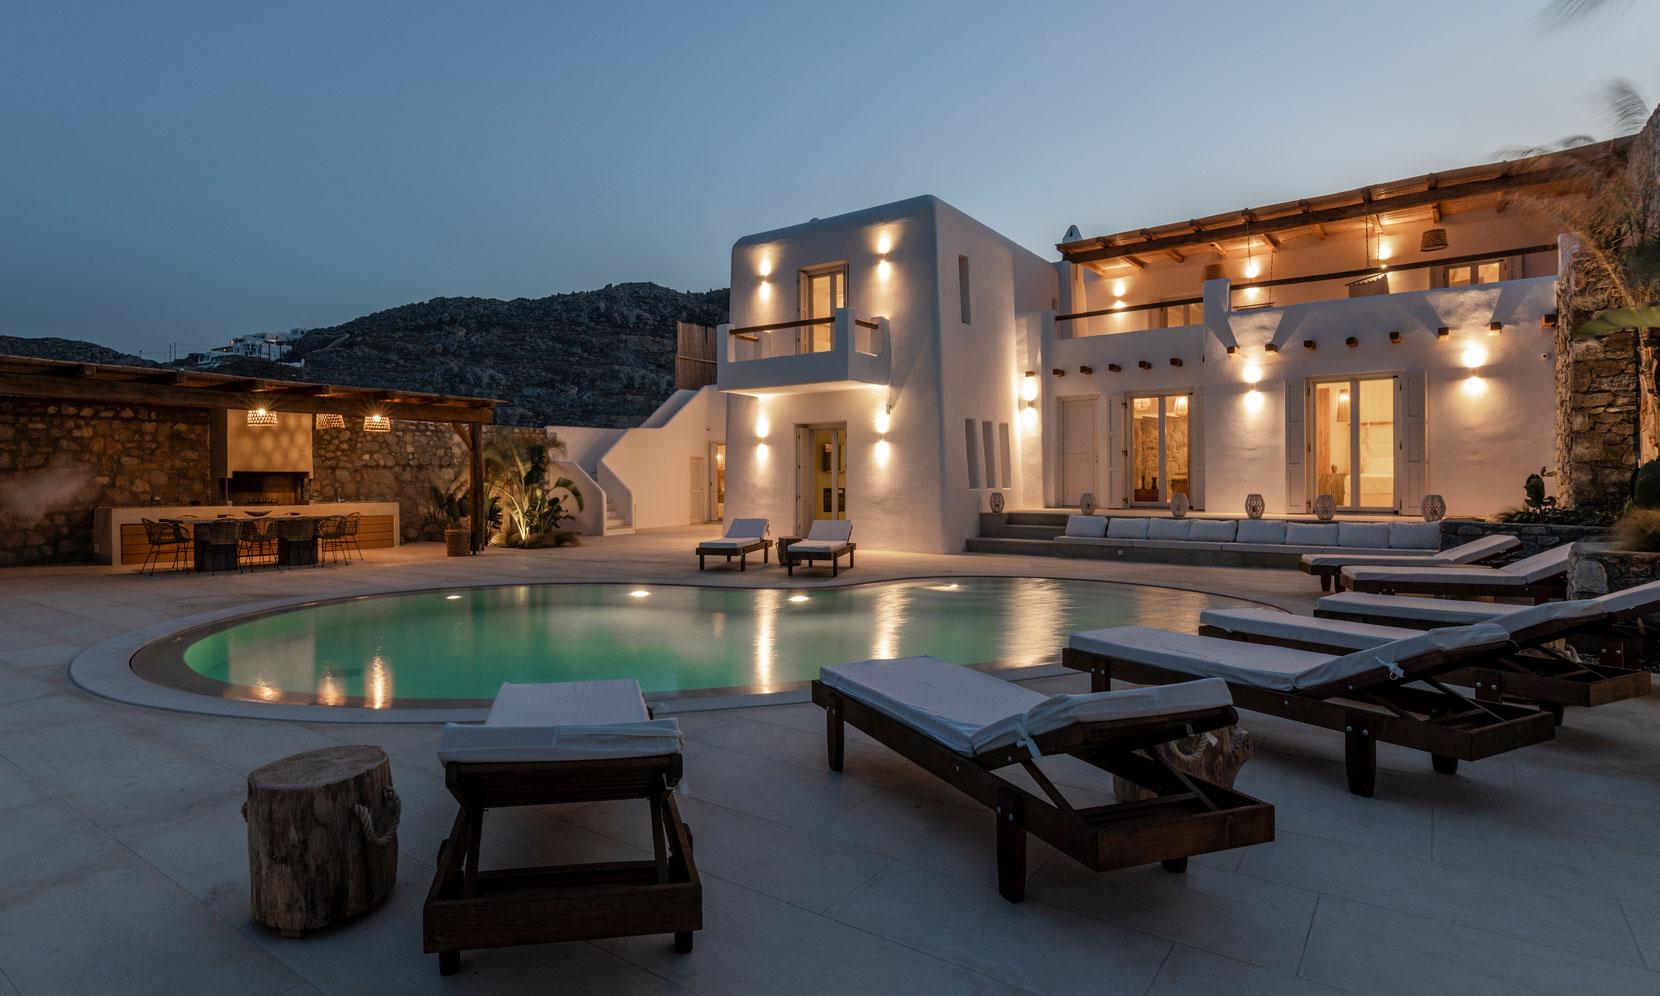 Mykonos Villa Brilene jumbotron image